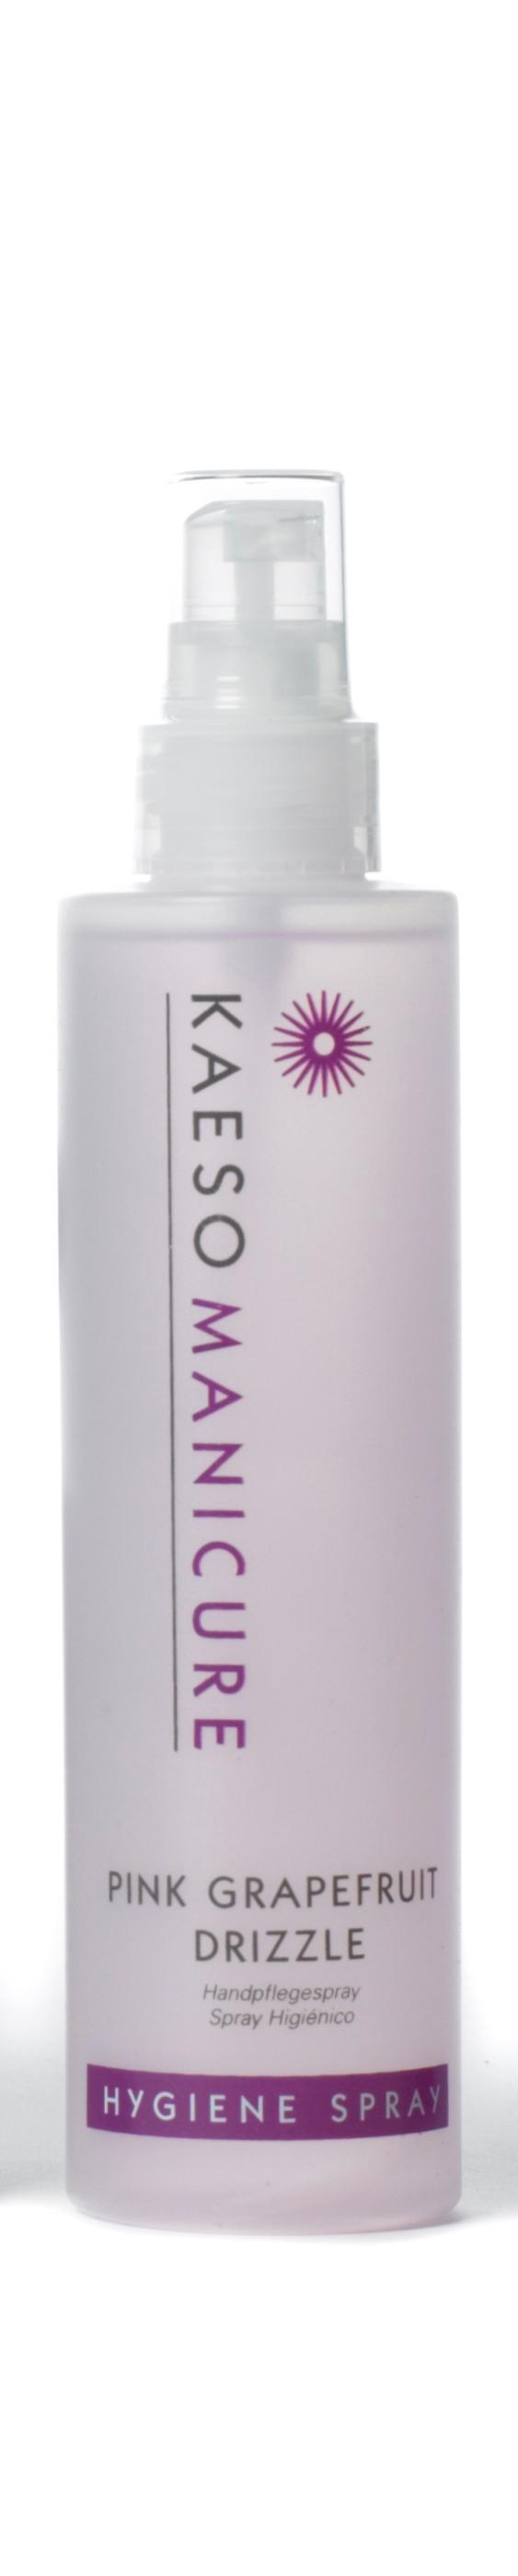 Kaeso Pink Grapefruit Drizzle Hygiene Spray 195ml